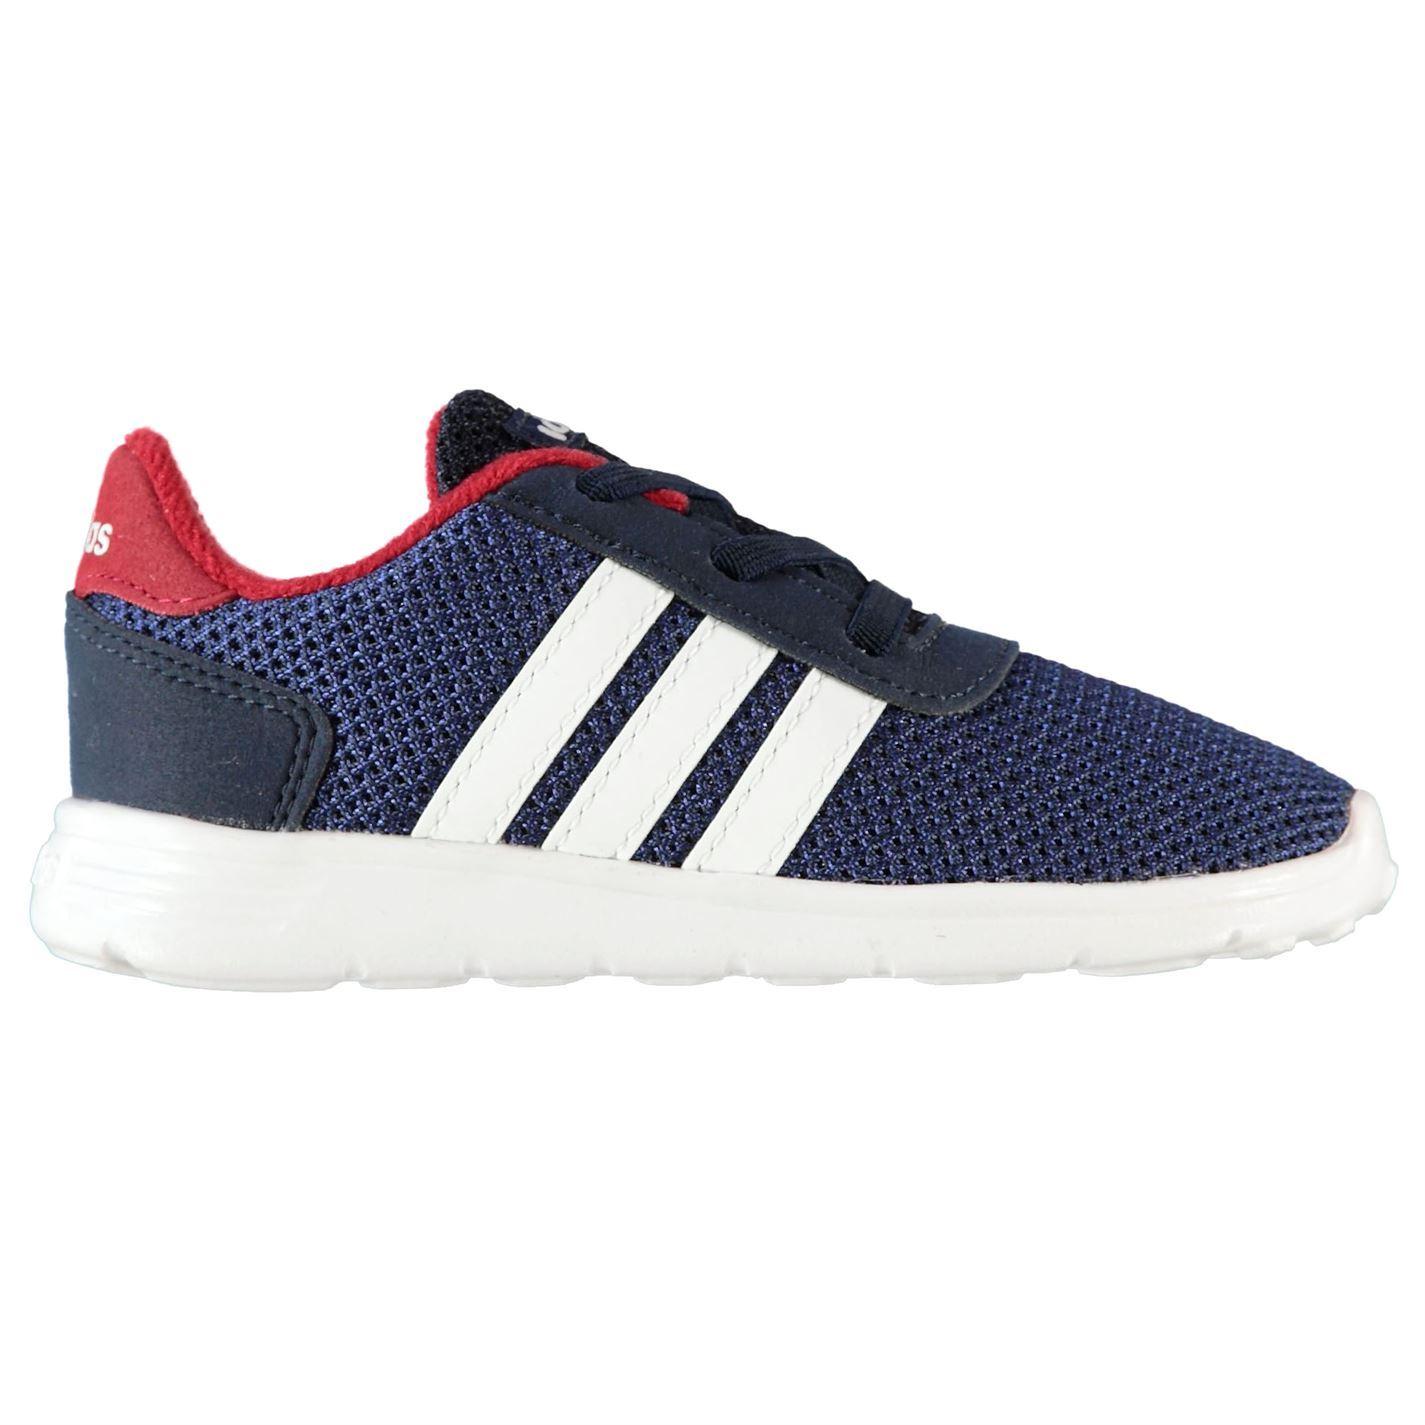 e9ddd442c ... Adidas Lite Racer instructores infantiles niños zapatos calzado ...